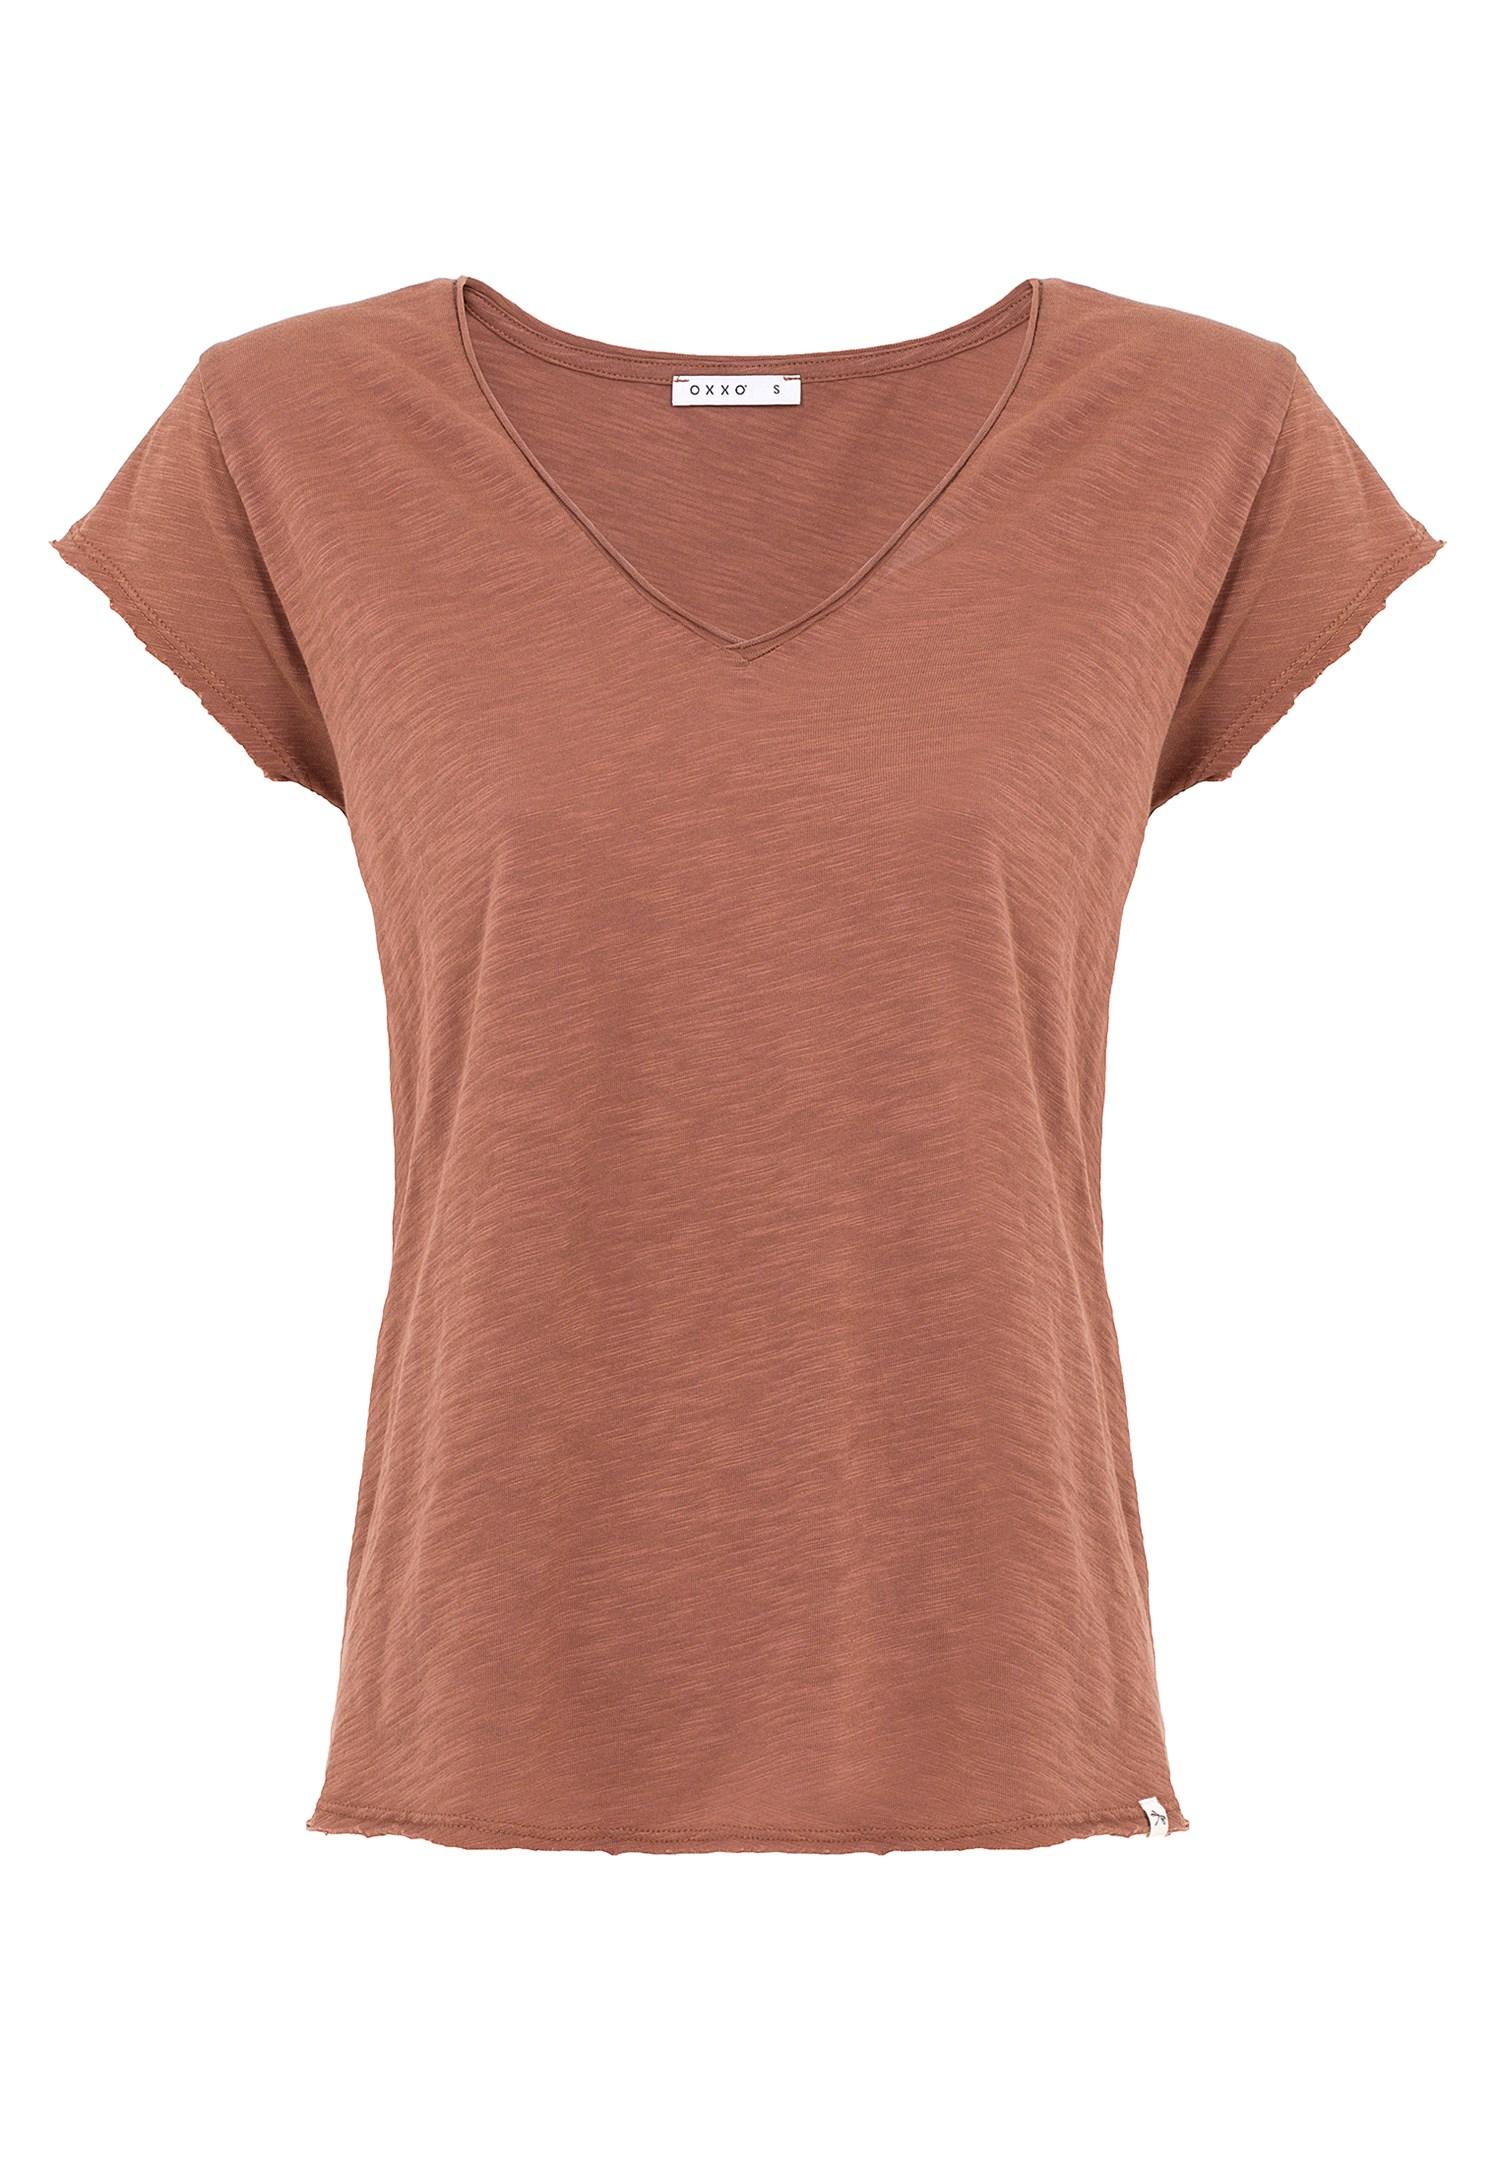 Bayan Kahverengi V Yaka Tişört